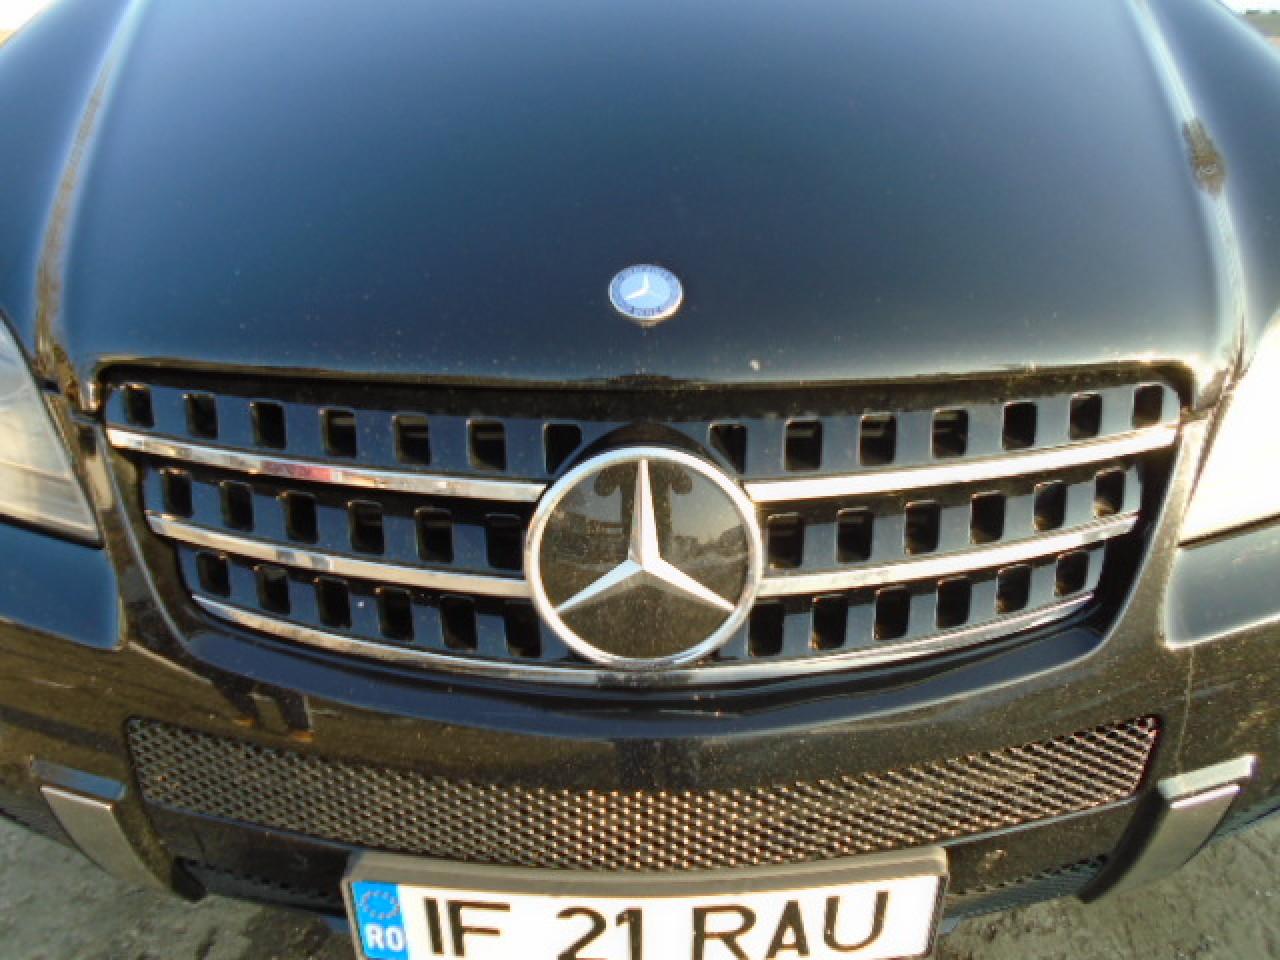 Fata Complete Mercedes Ml W164 420 Cdi TIP 629.912 4Matic AMG